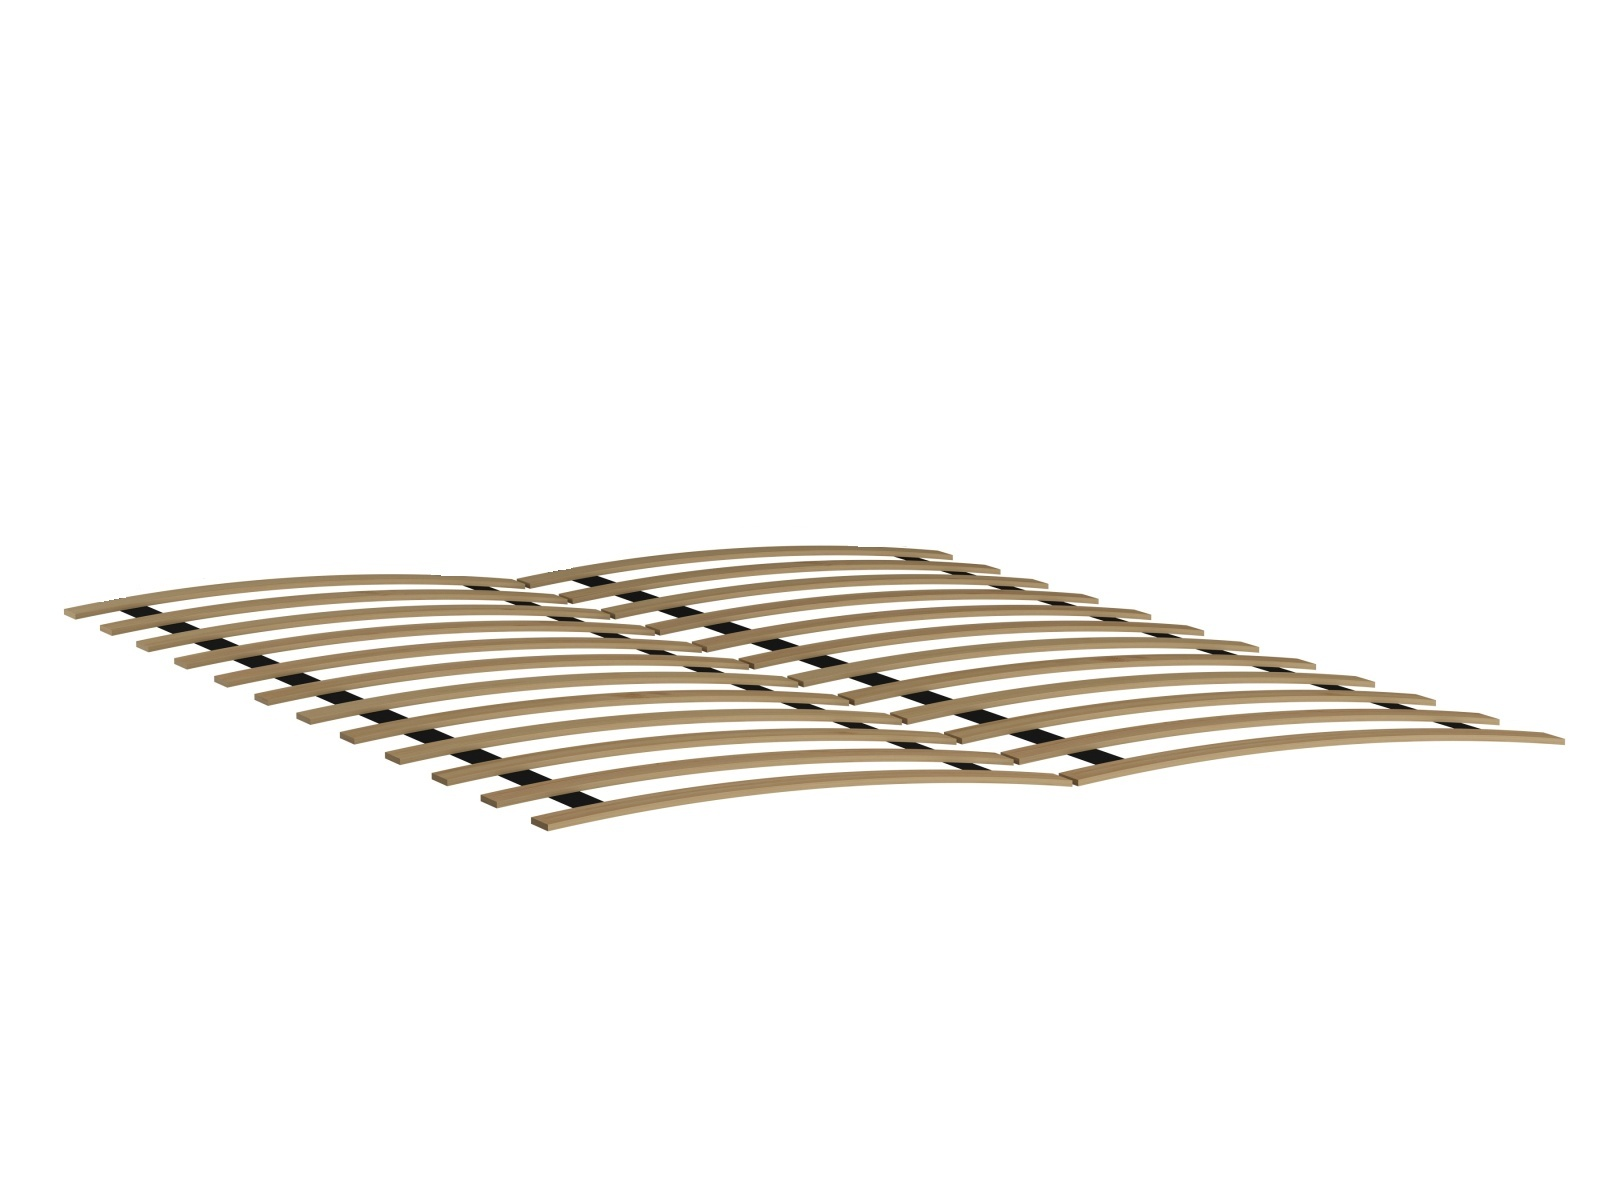 MAGNAT Rošt 140x200 cm, lamelový